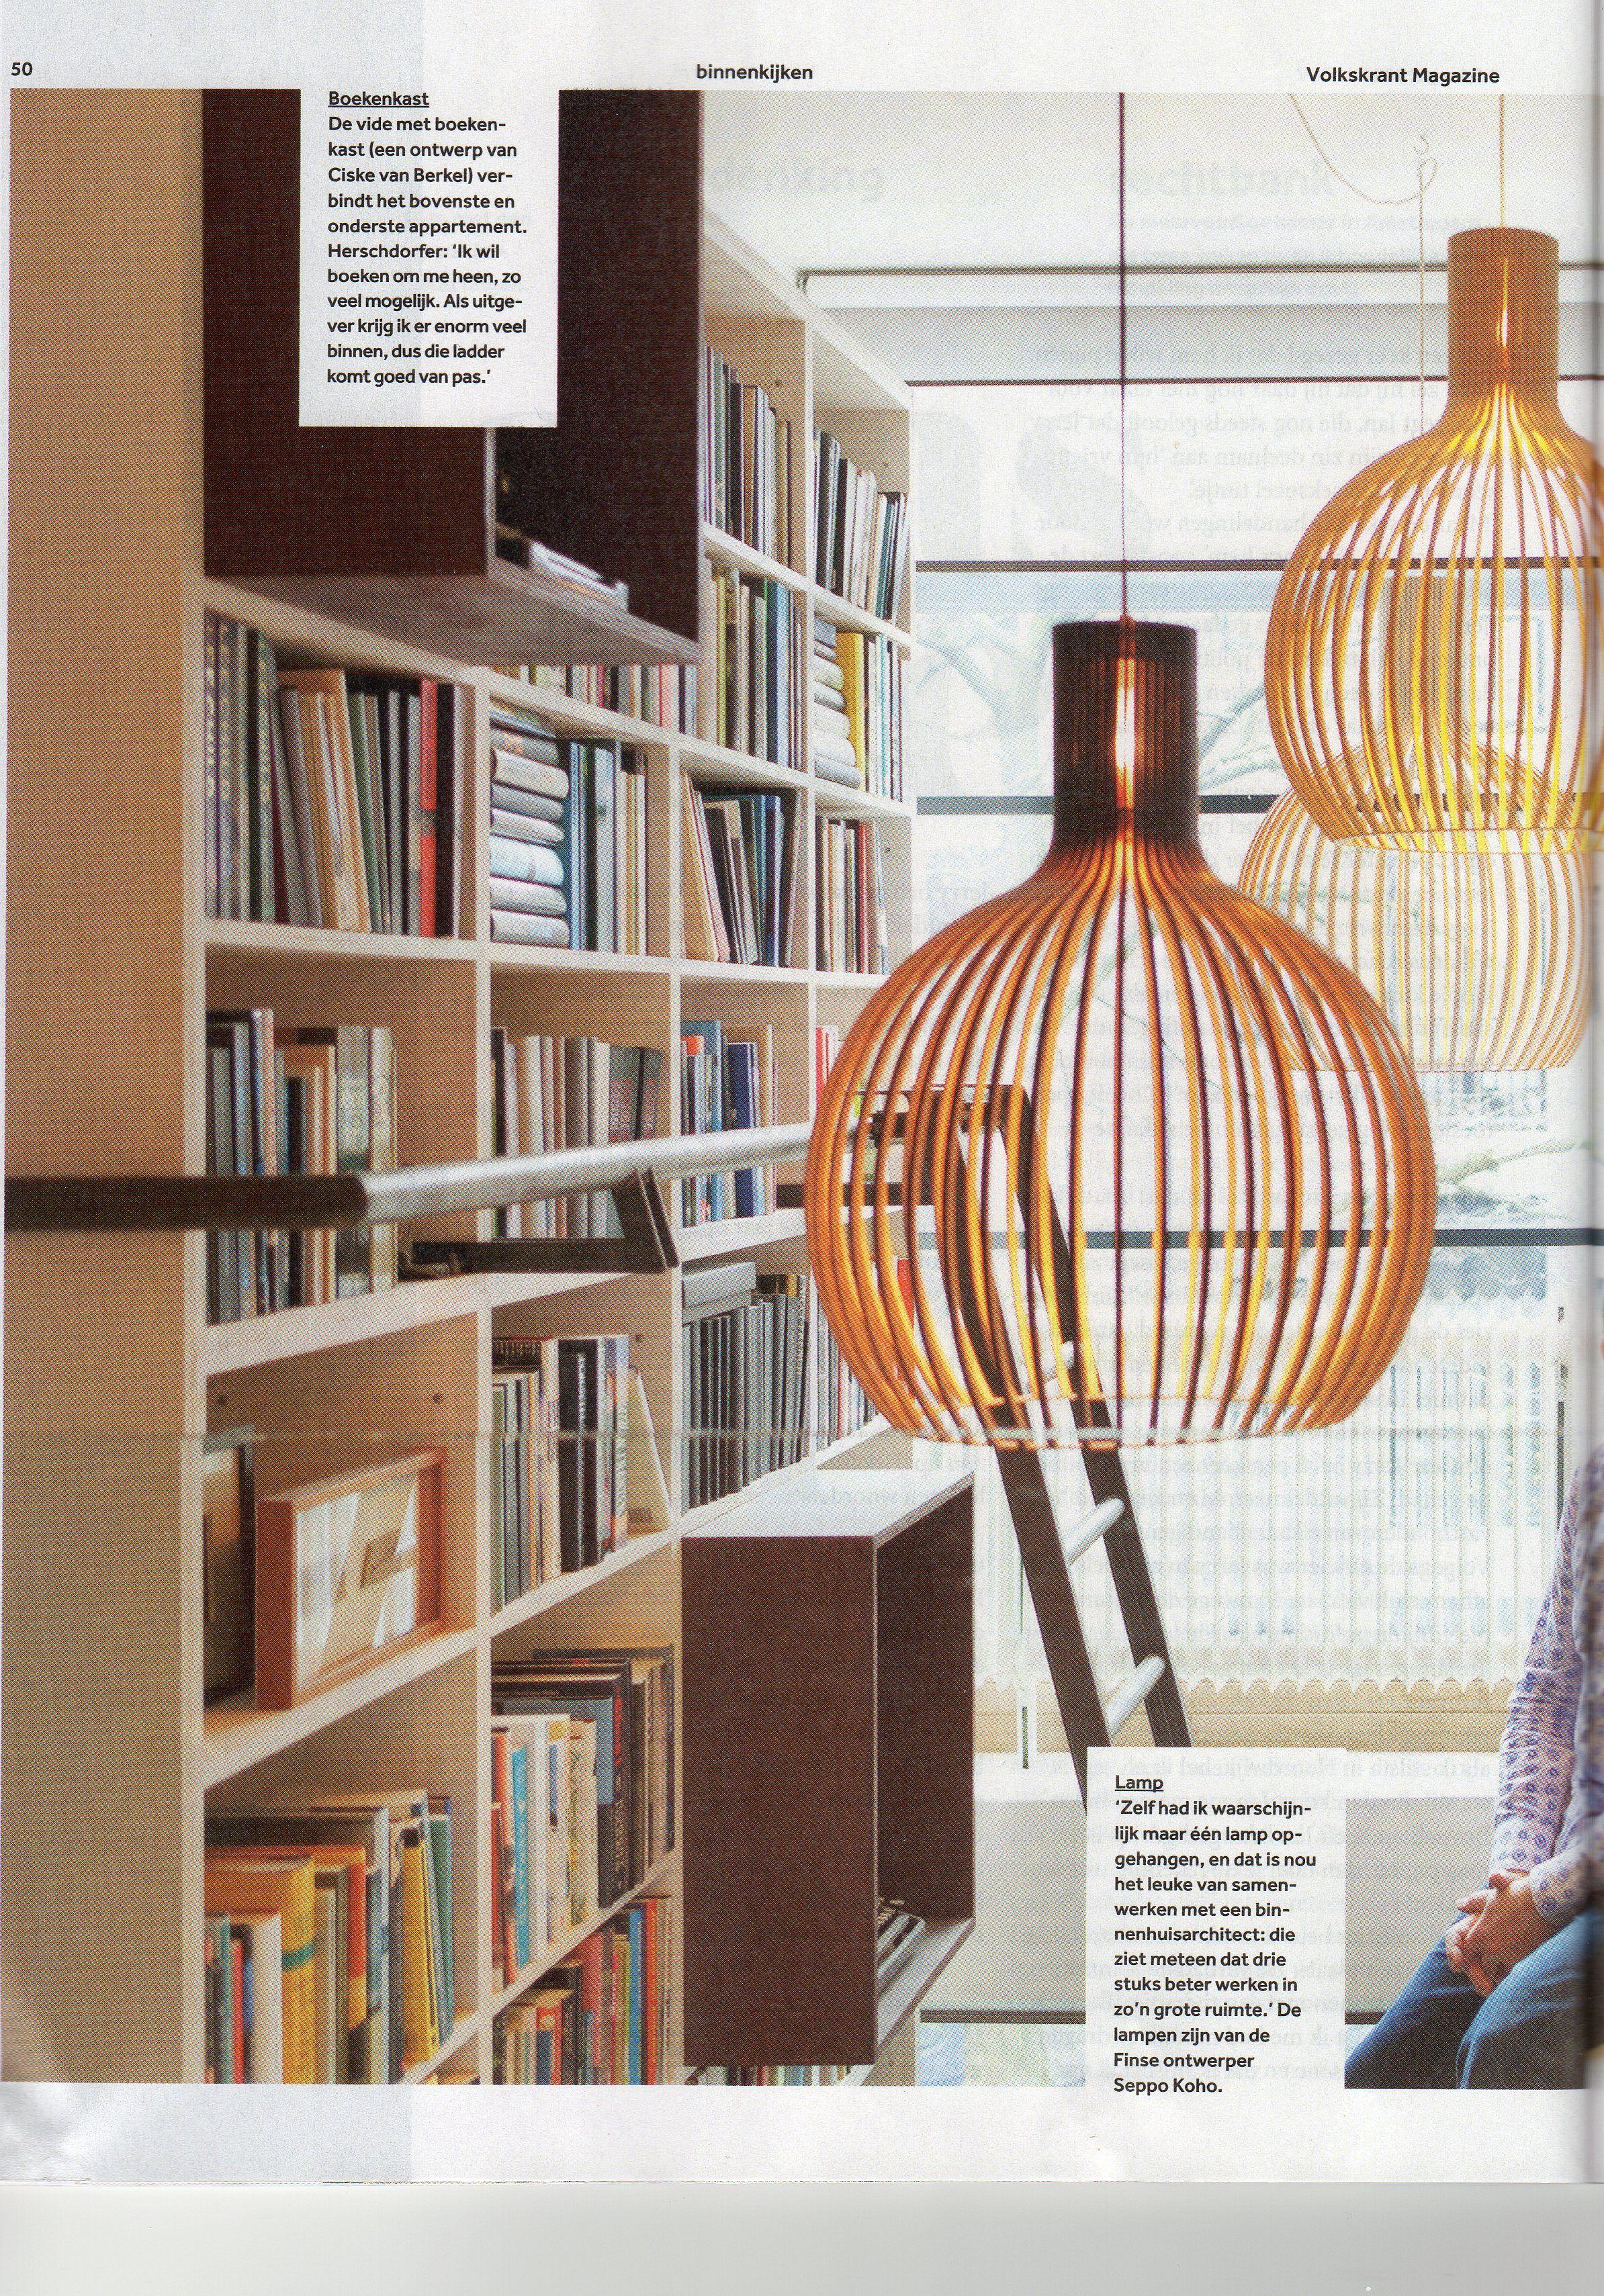 mooie hoge boekenkast | wandrekken/-kasten | Pinterest - Kasten